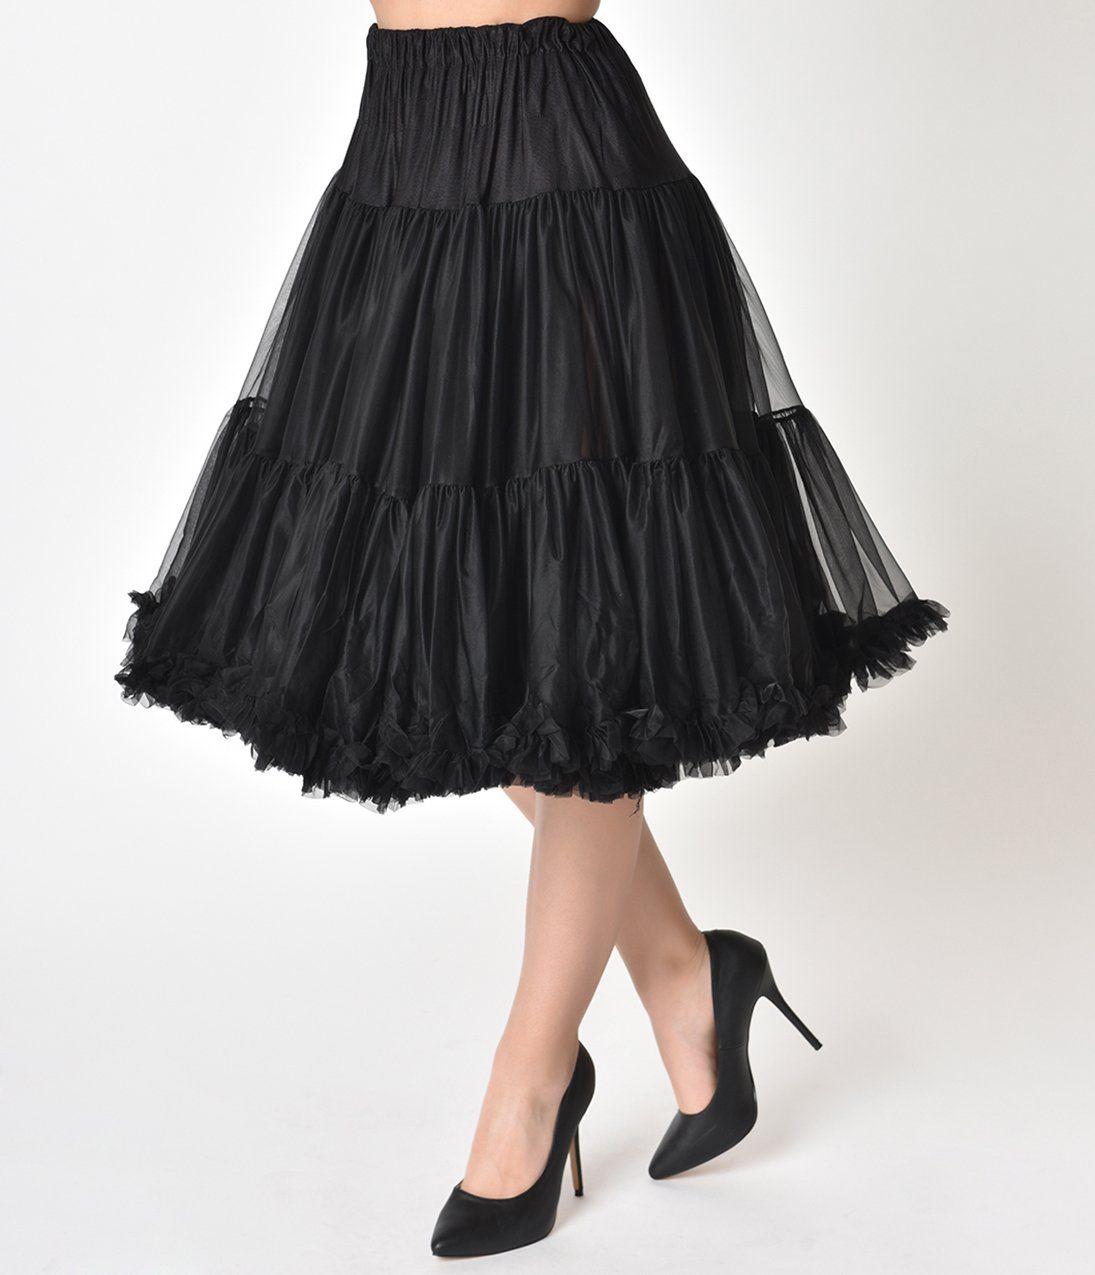 184aa0c56c941 1950s Style Black Tea Length Ruffled Chiffon Petticoat Crinoline – Unique  Vintage